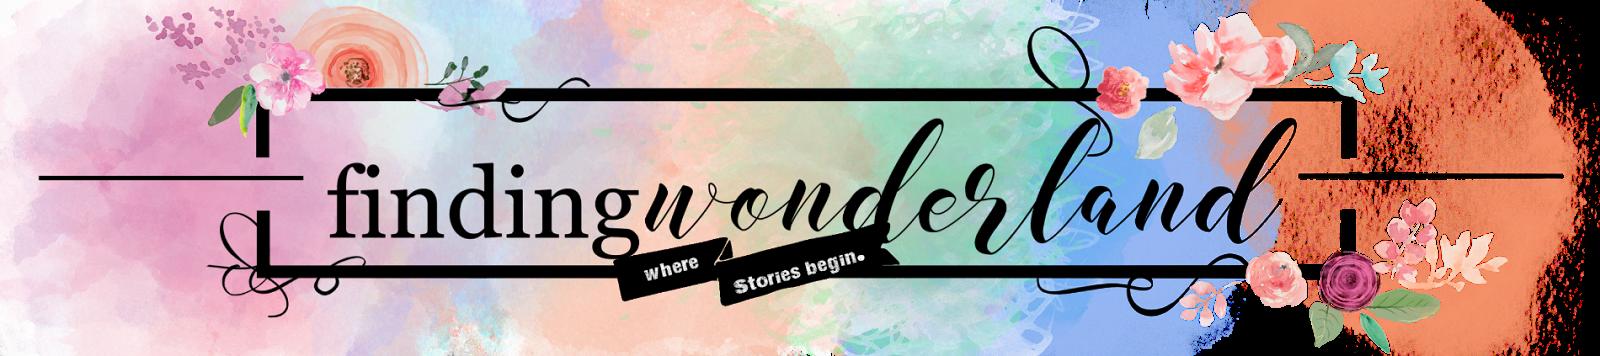 Finding Wonderland | Where Stories Begin